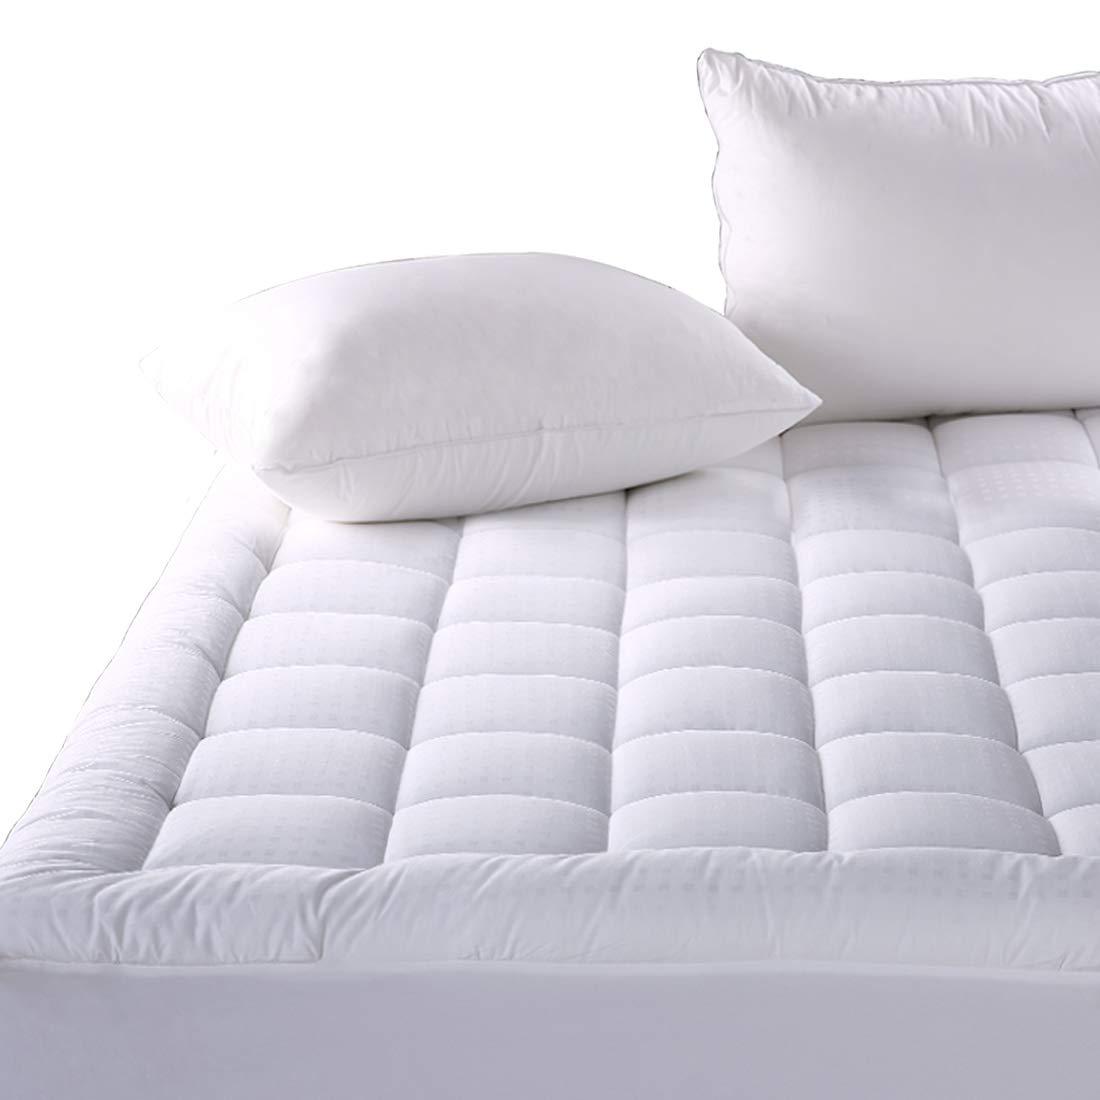 Balichun Mattress Pad Cover Queen Size Pillowtop 300TC Down Alternative Mattress Topper with 8-21-Inch Deep Pocket by Balichun